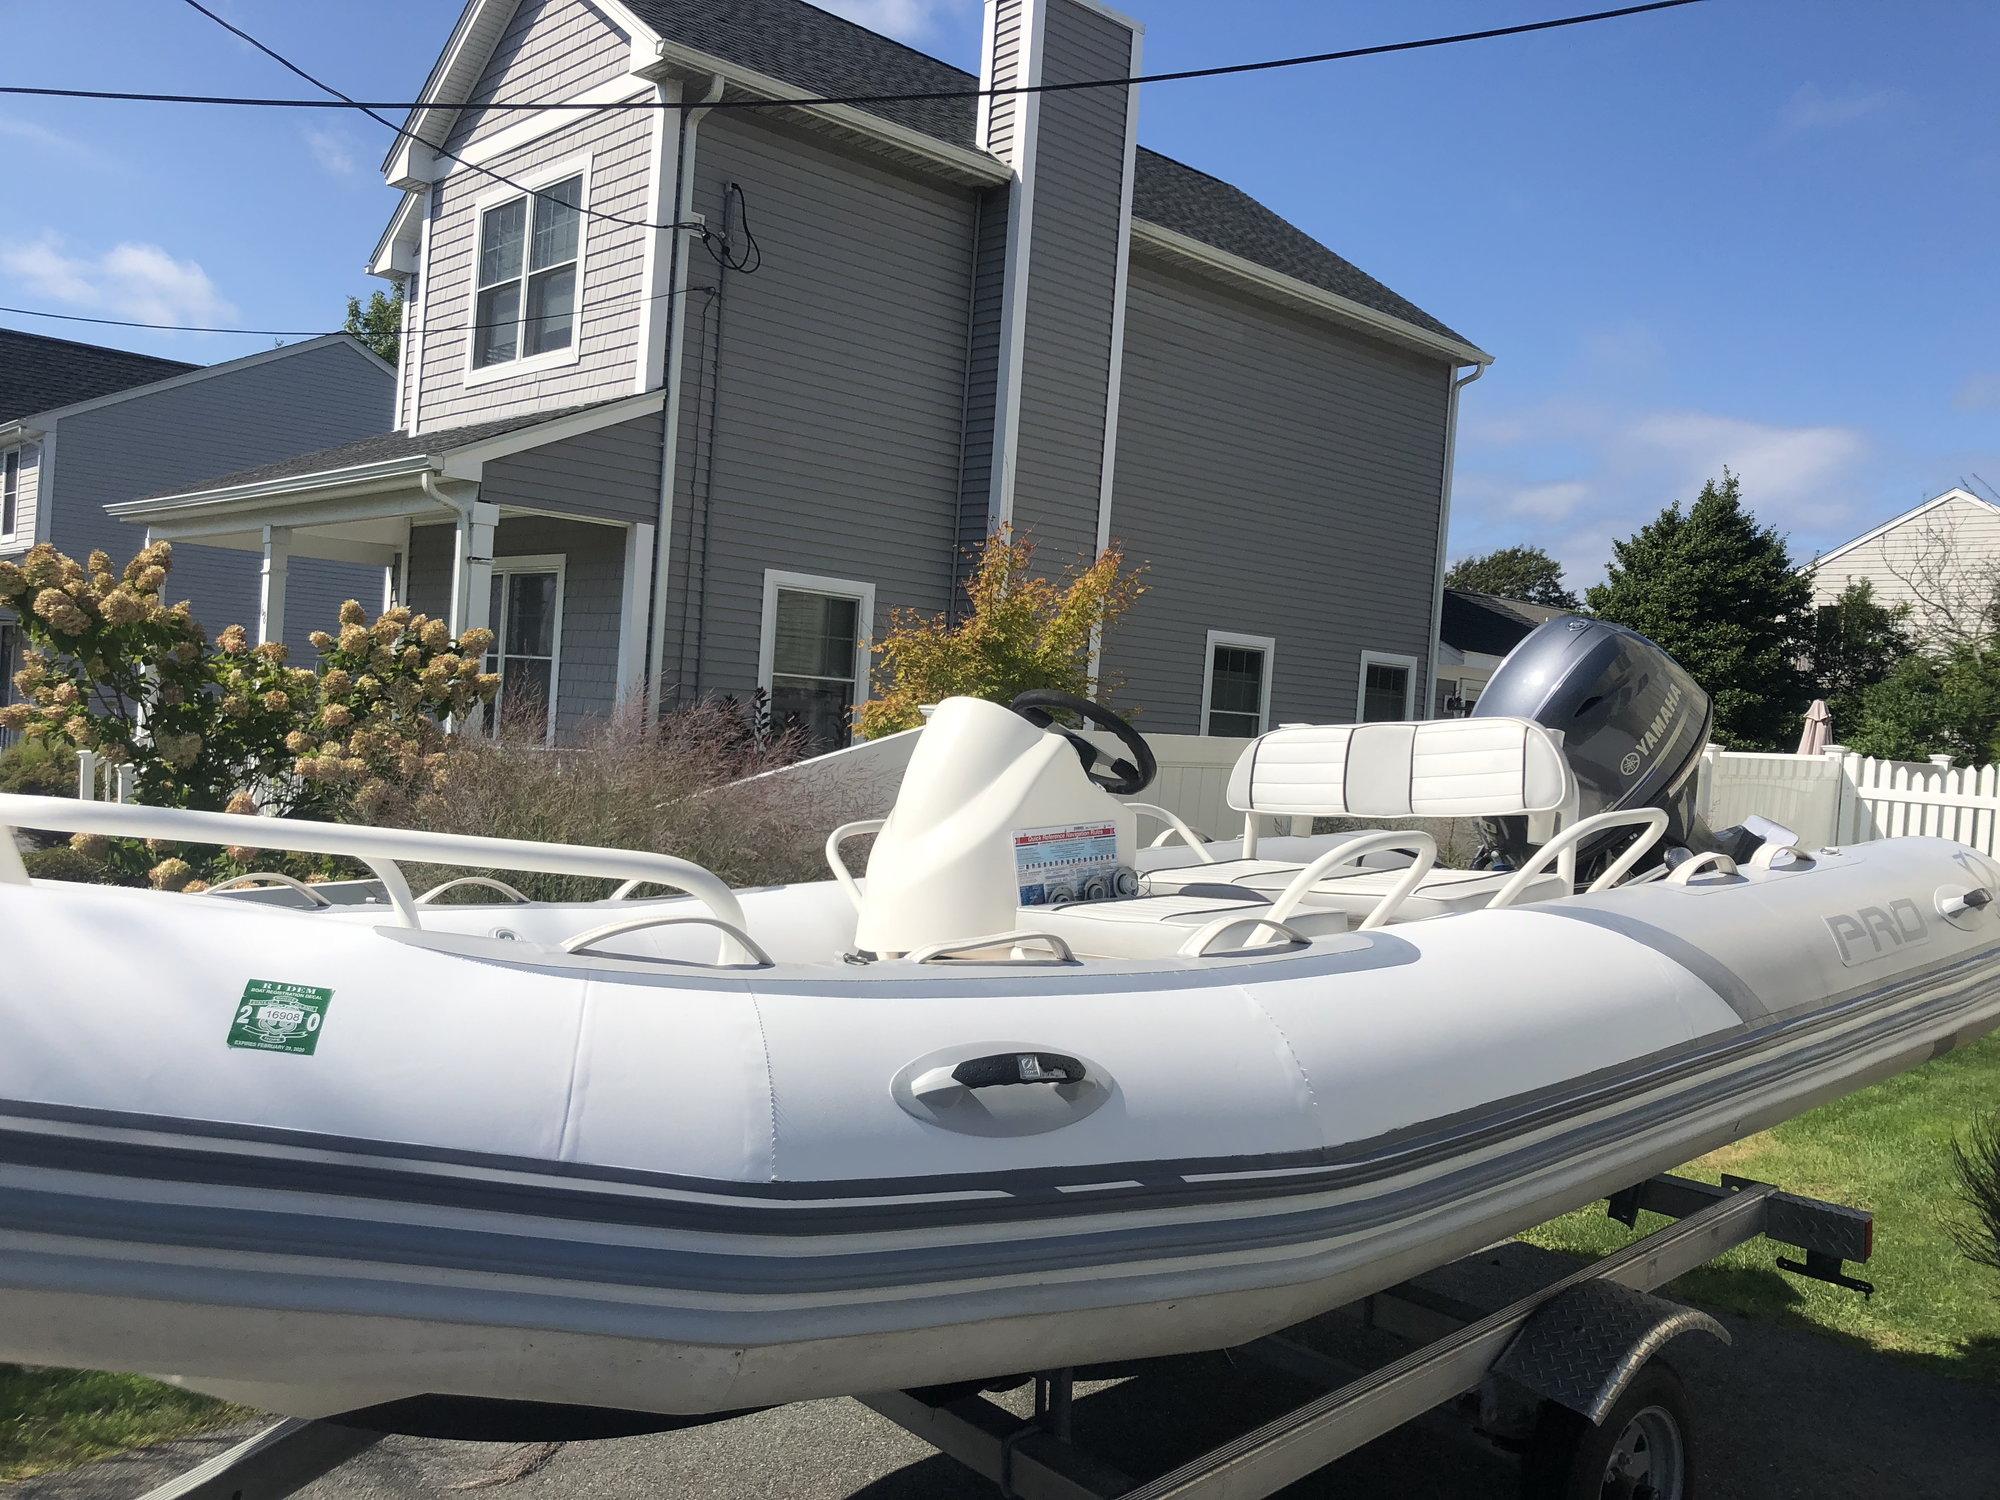 Like New 2106 Zodiac Bayrunner 500 Pro - $19,900  Newport RI - The